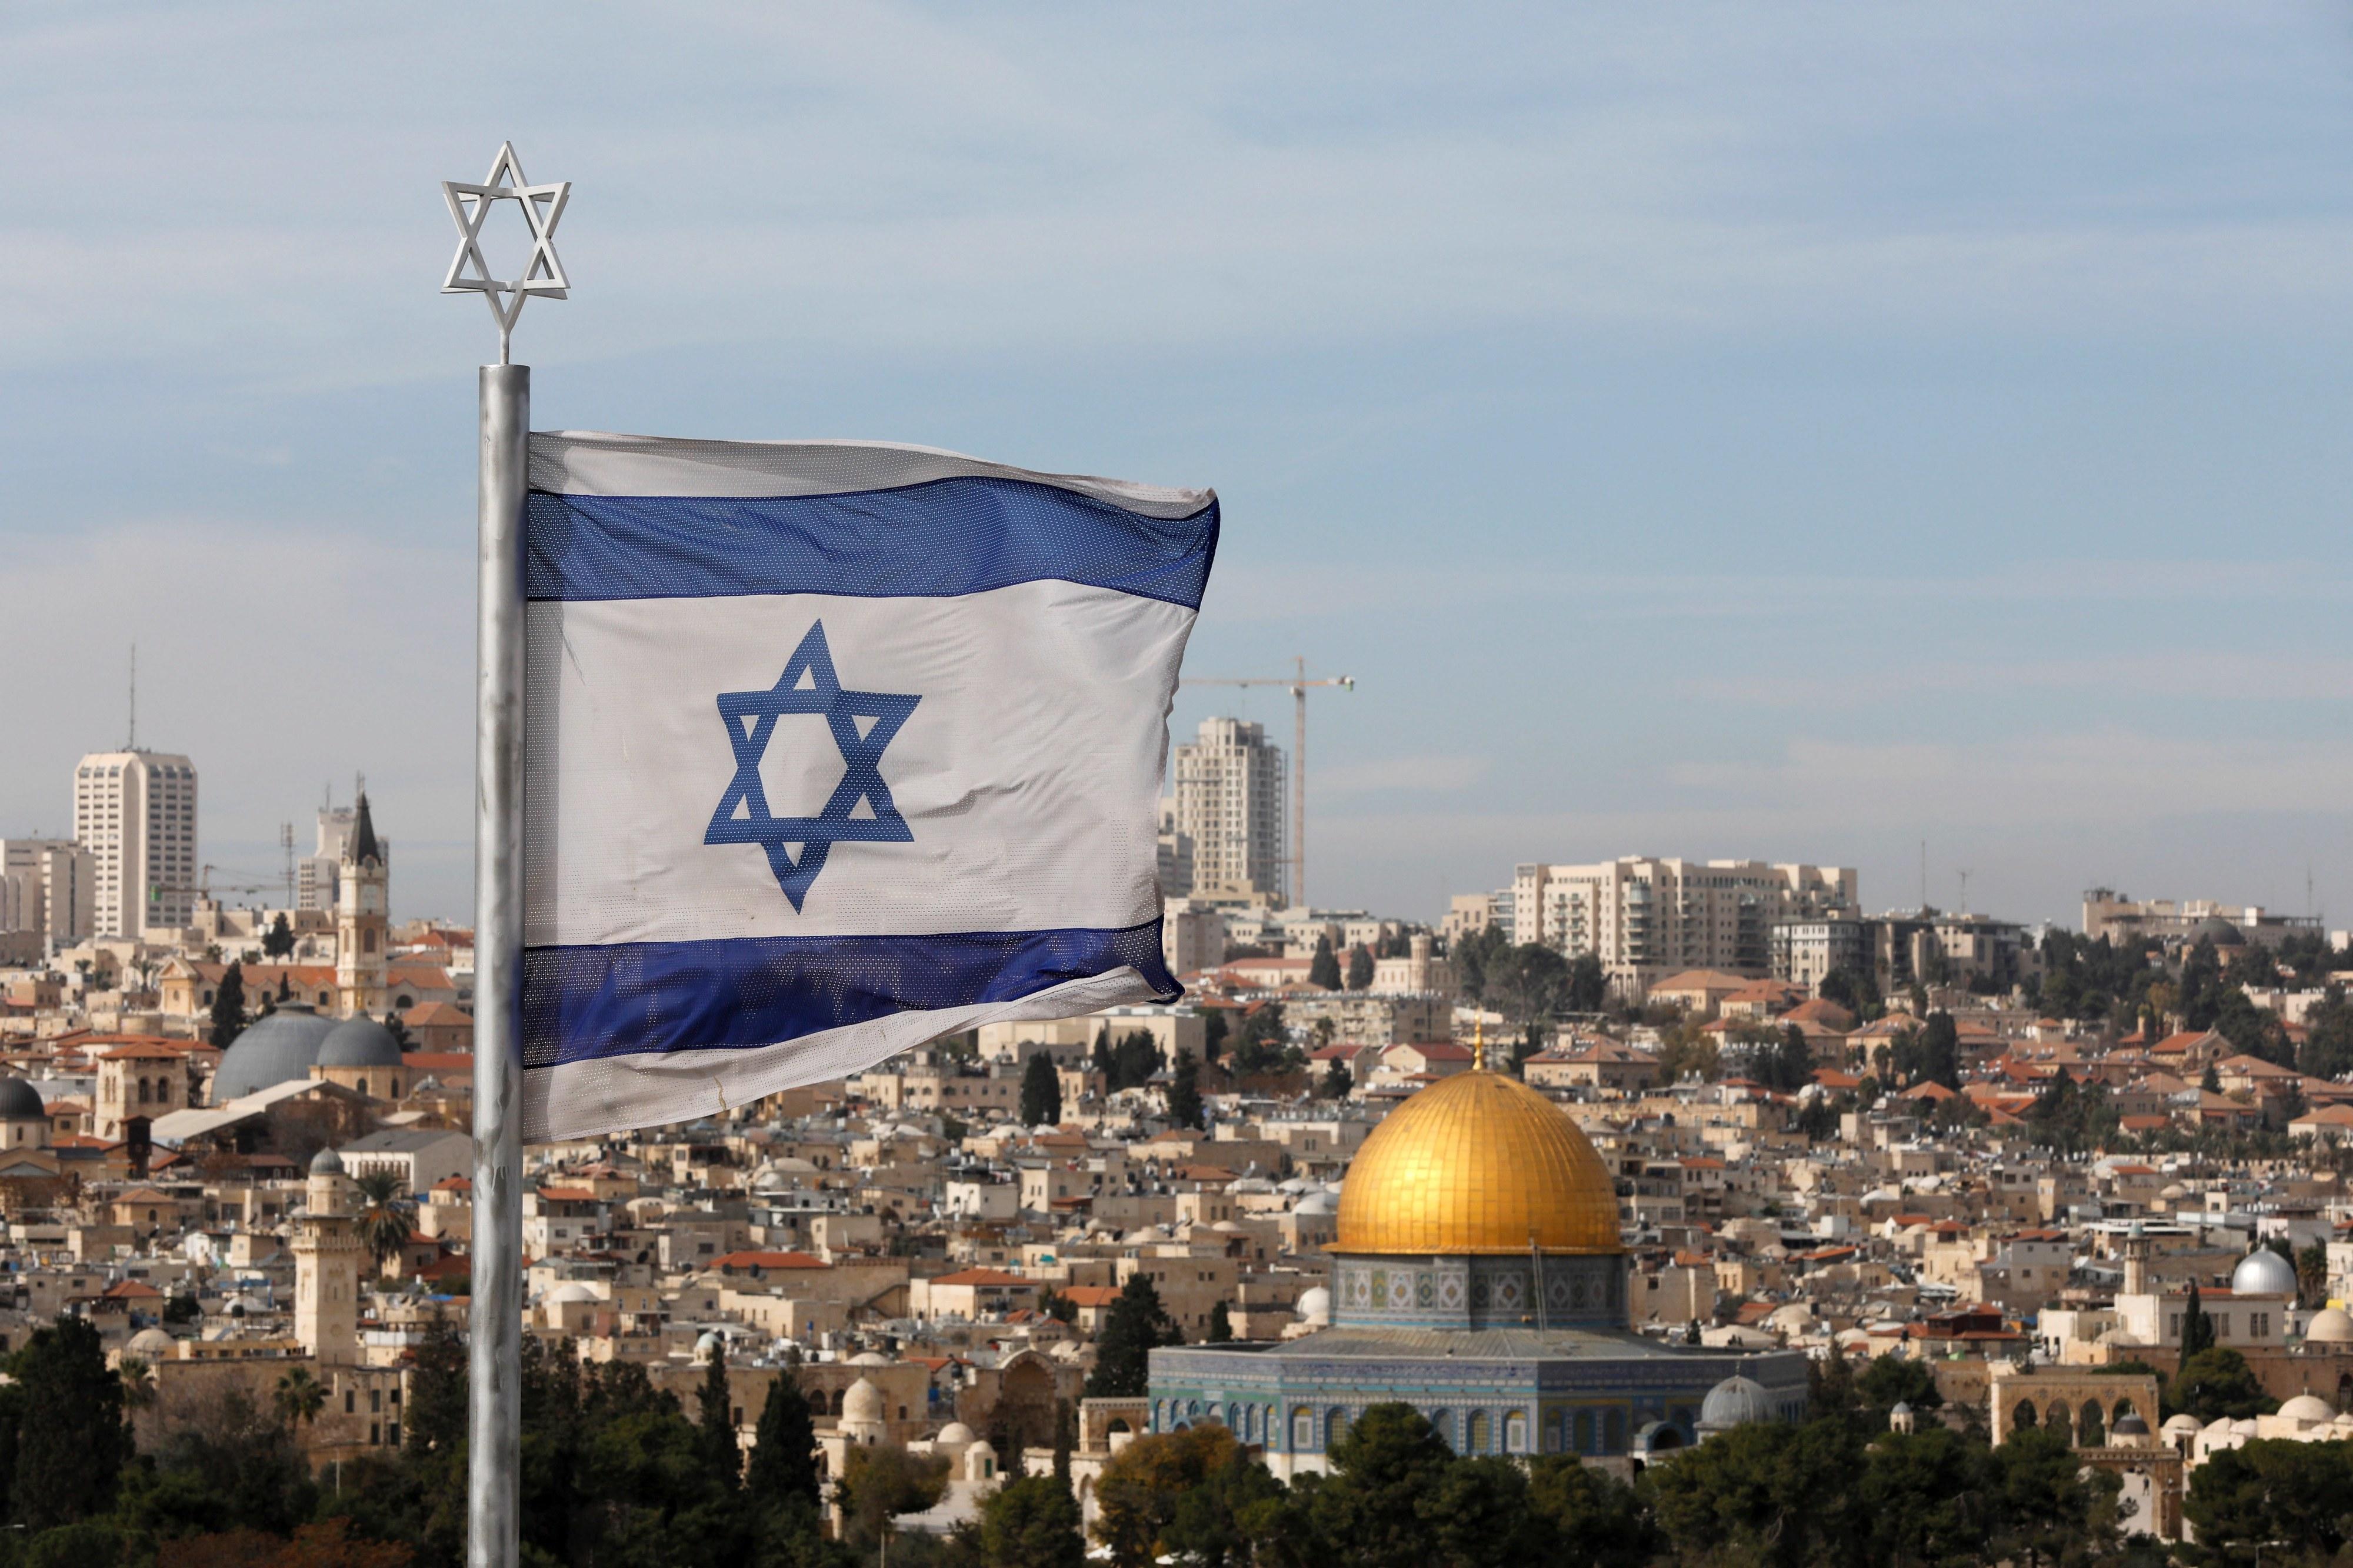 Israel anula plano de expulsão de parte dos 42.000 migrantes africanos